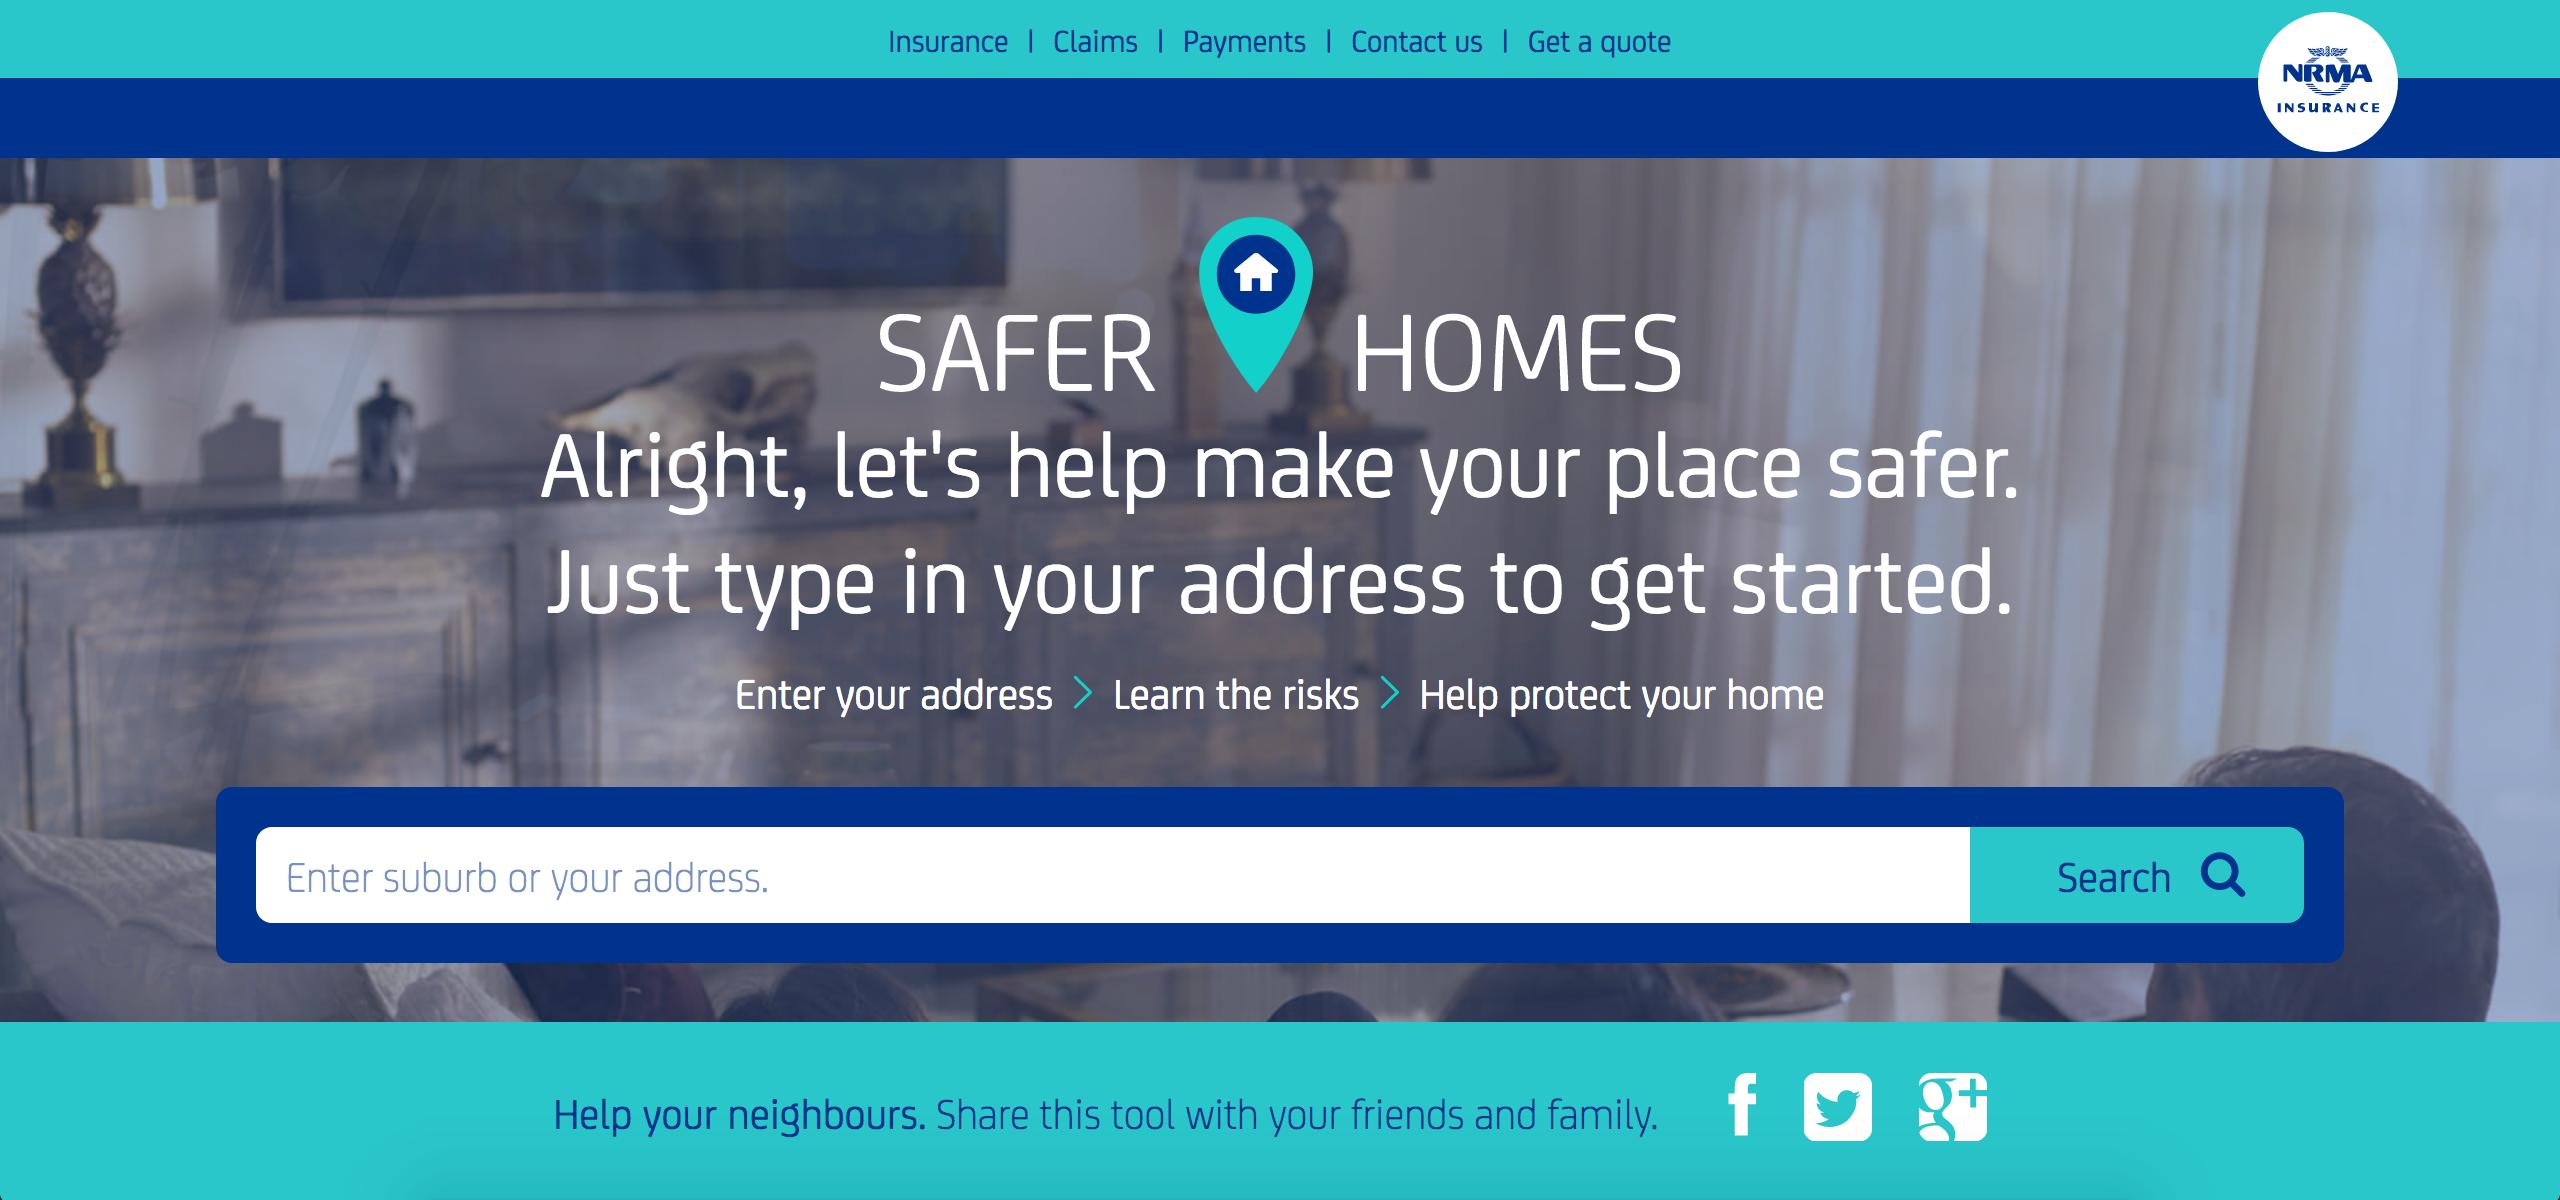 nrma-insurance-safer-homes